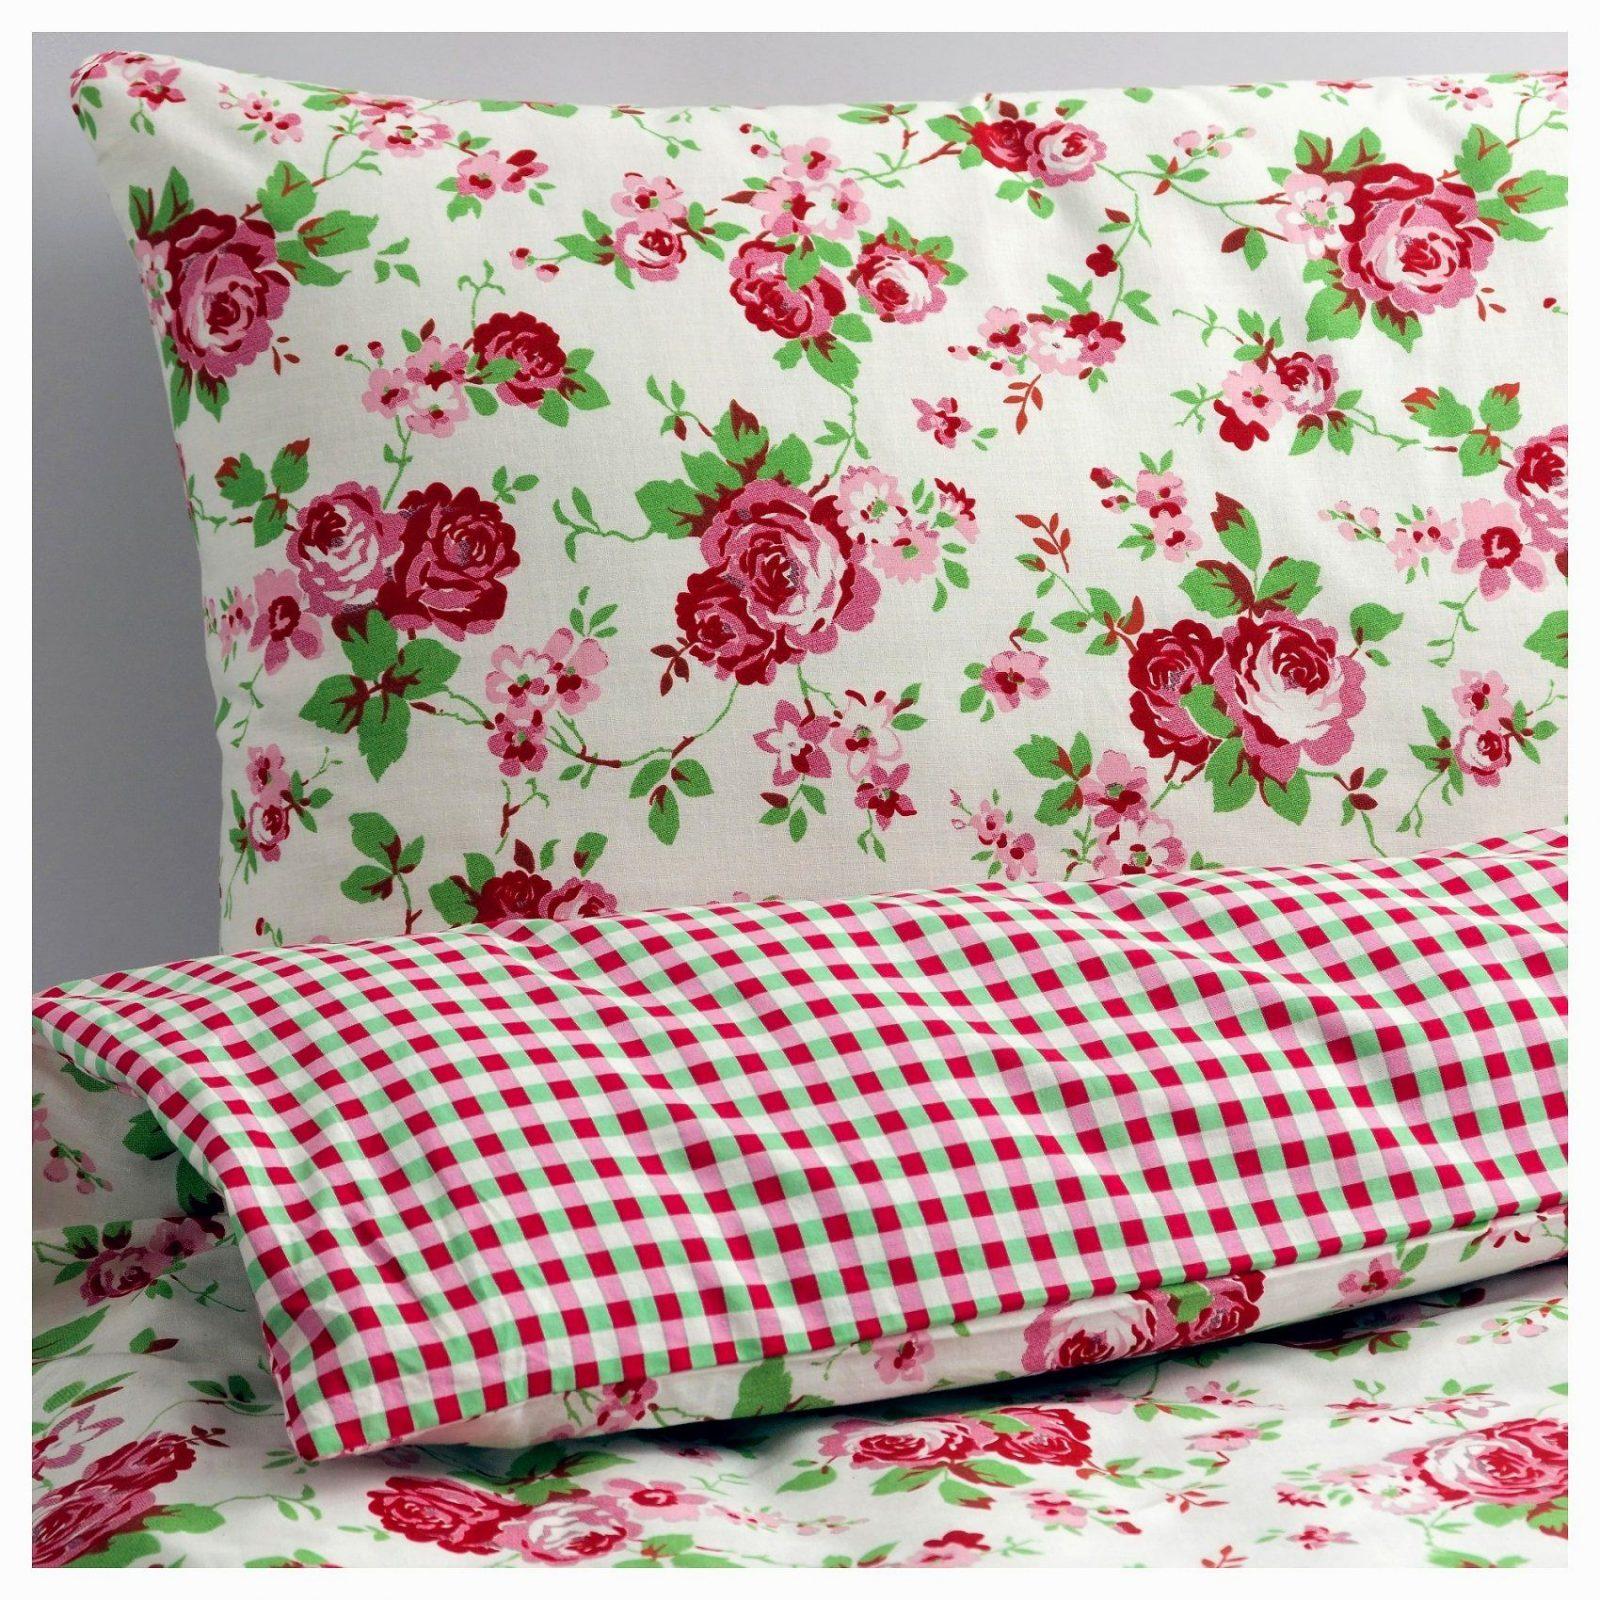 rosen bettw sche ikea haus design ideen. Black Bedroom Furniture Sets. Home Design Ideas